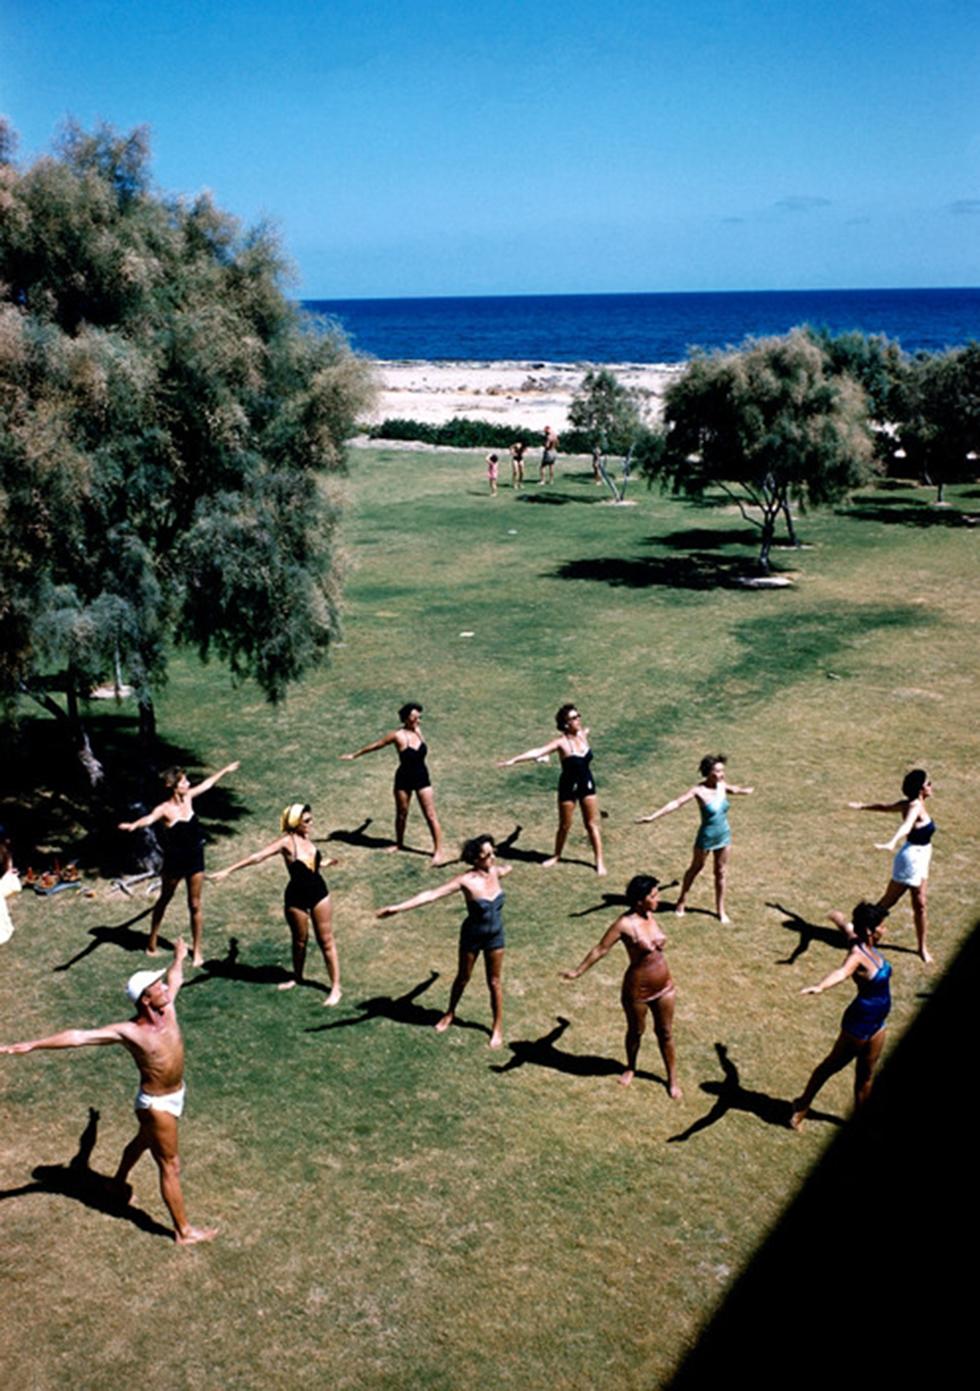 Tel Aviv's famed Independence Park, 1952, hosting an aerobics group (Photo: David Seymour)